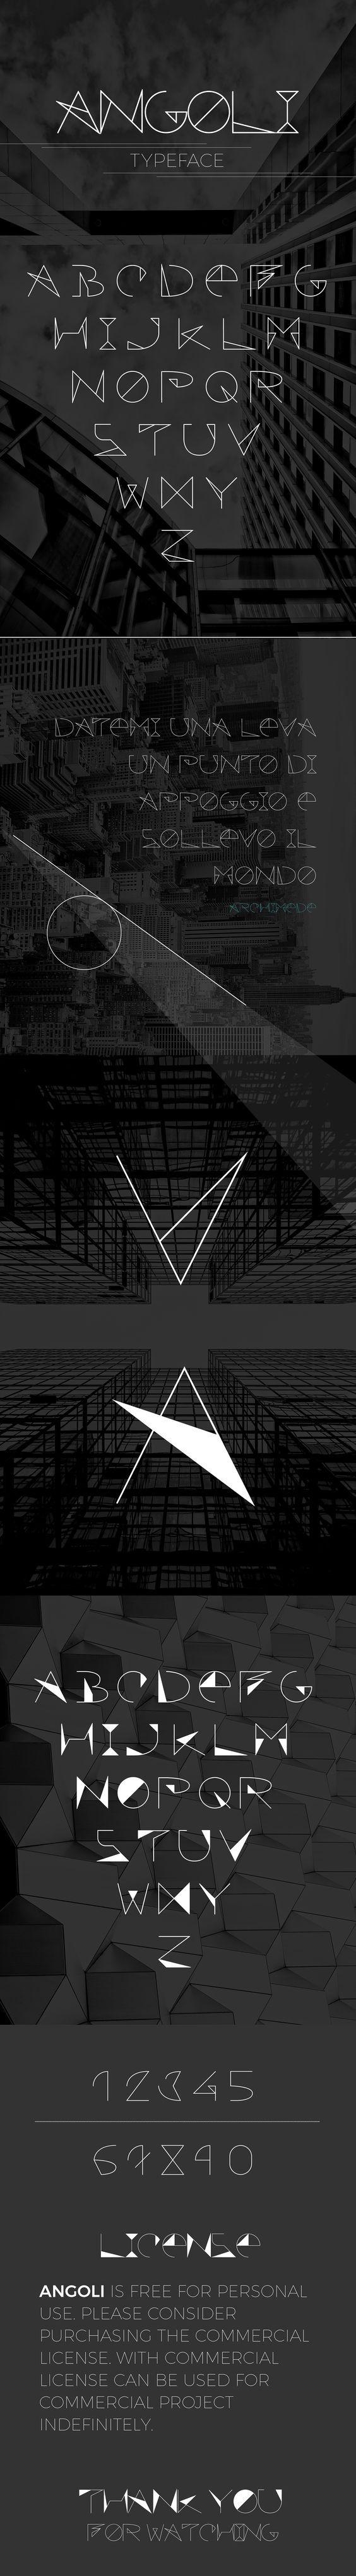 ANGOLI - Free typeface par Matteo Colombo - 10